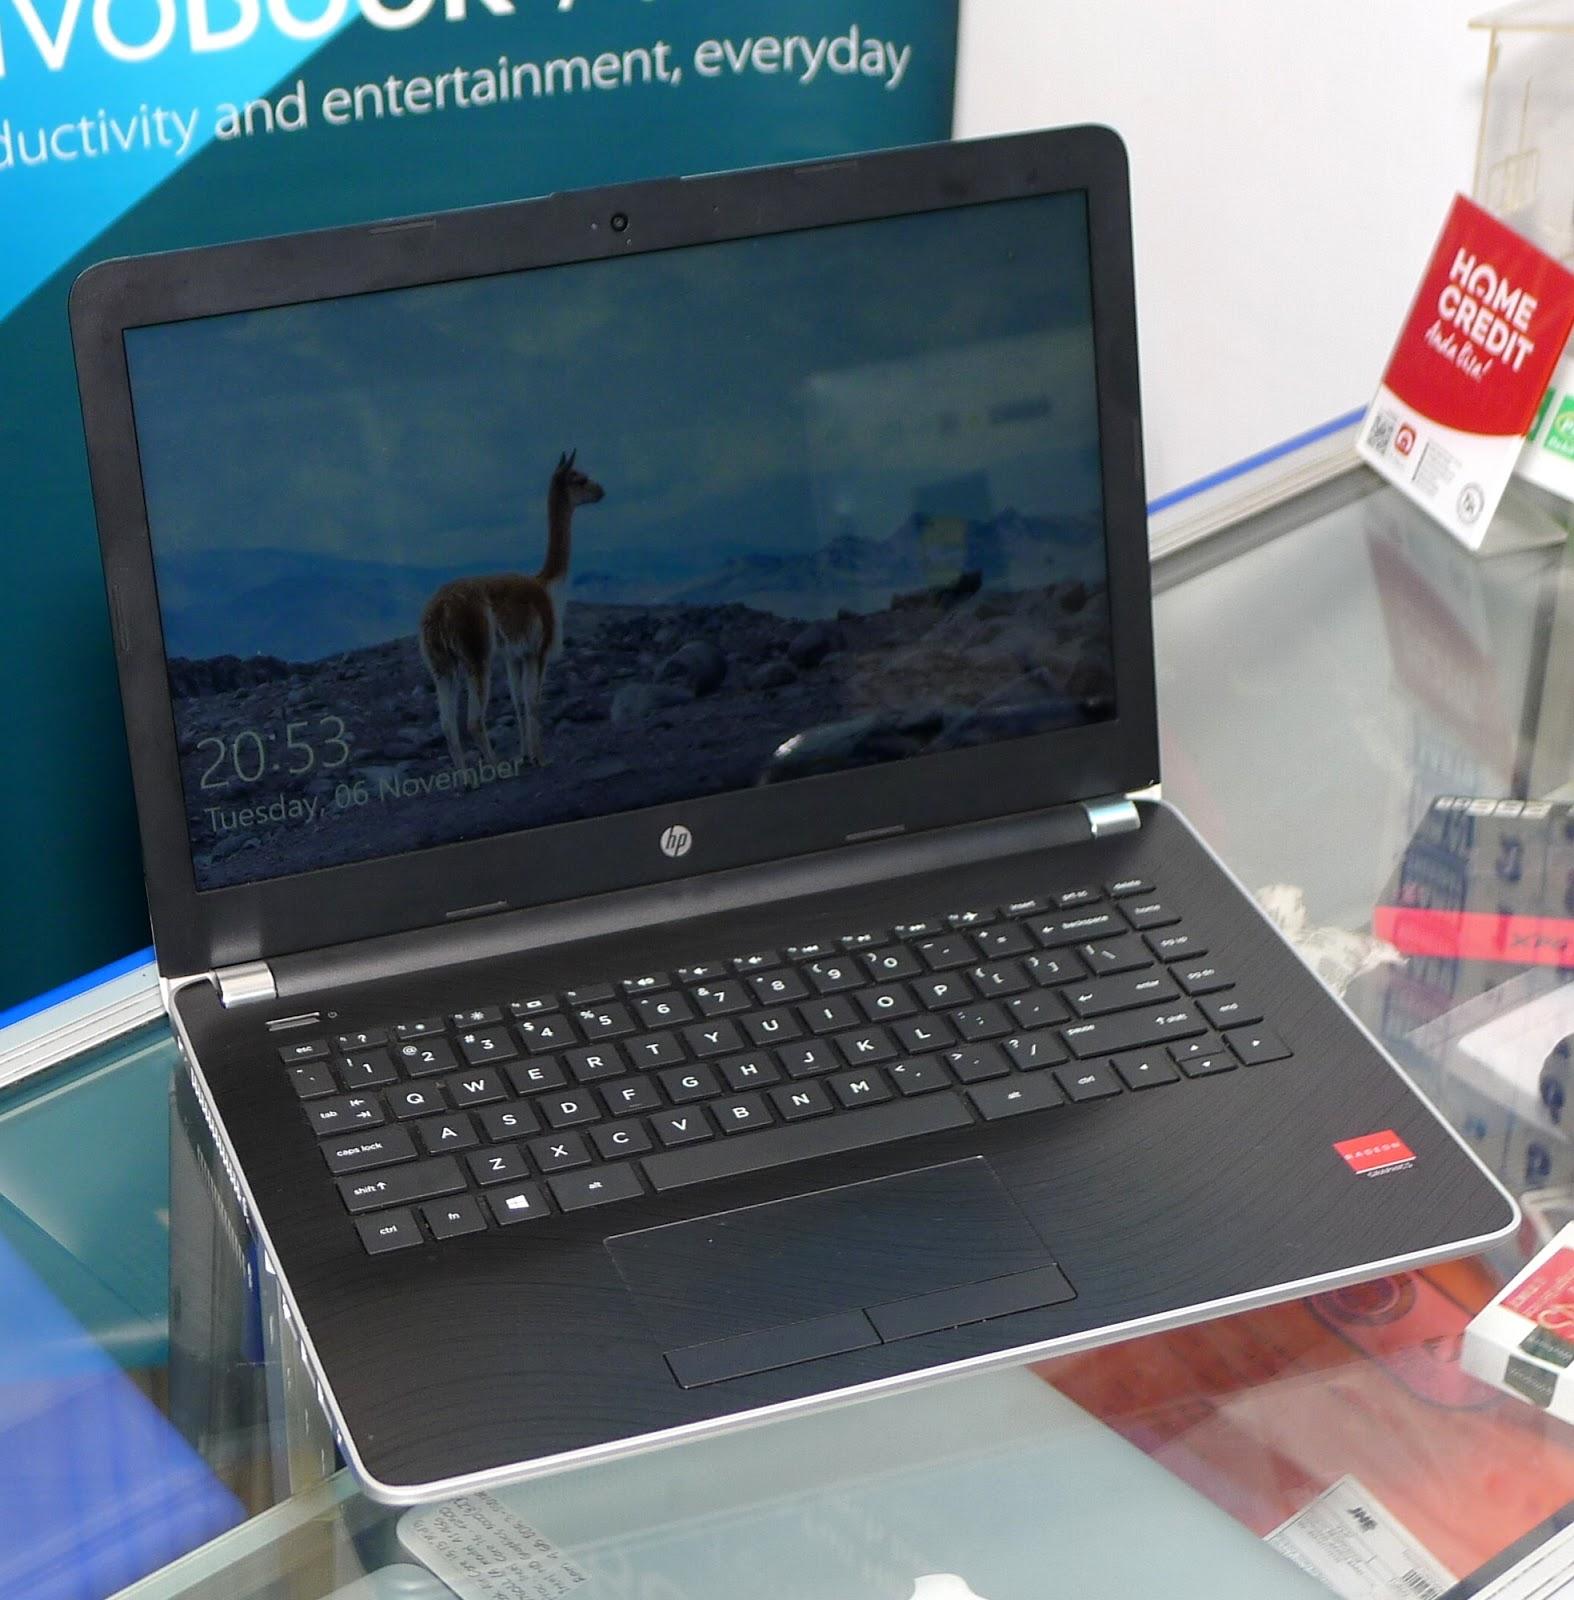 Jual Laptop Hp 14 Bw023ax Amd A9 Second Fullset Jual Beli Laptop Bekas Kamera Service Sparepart Di Malang